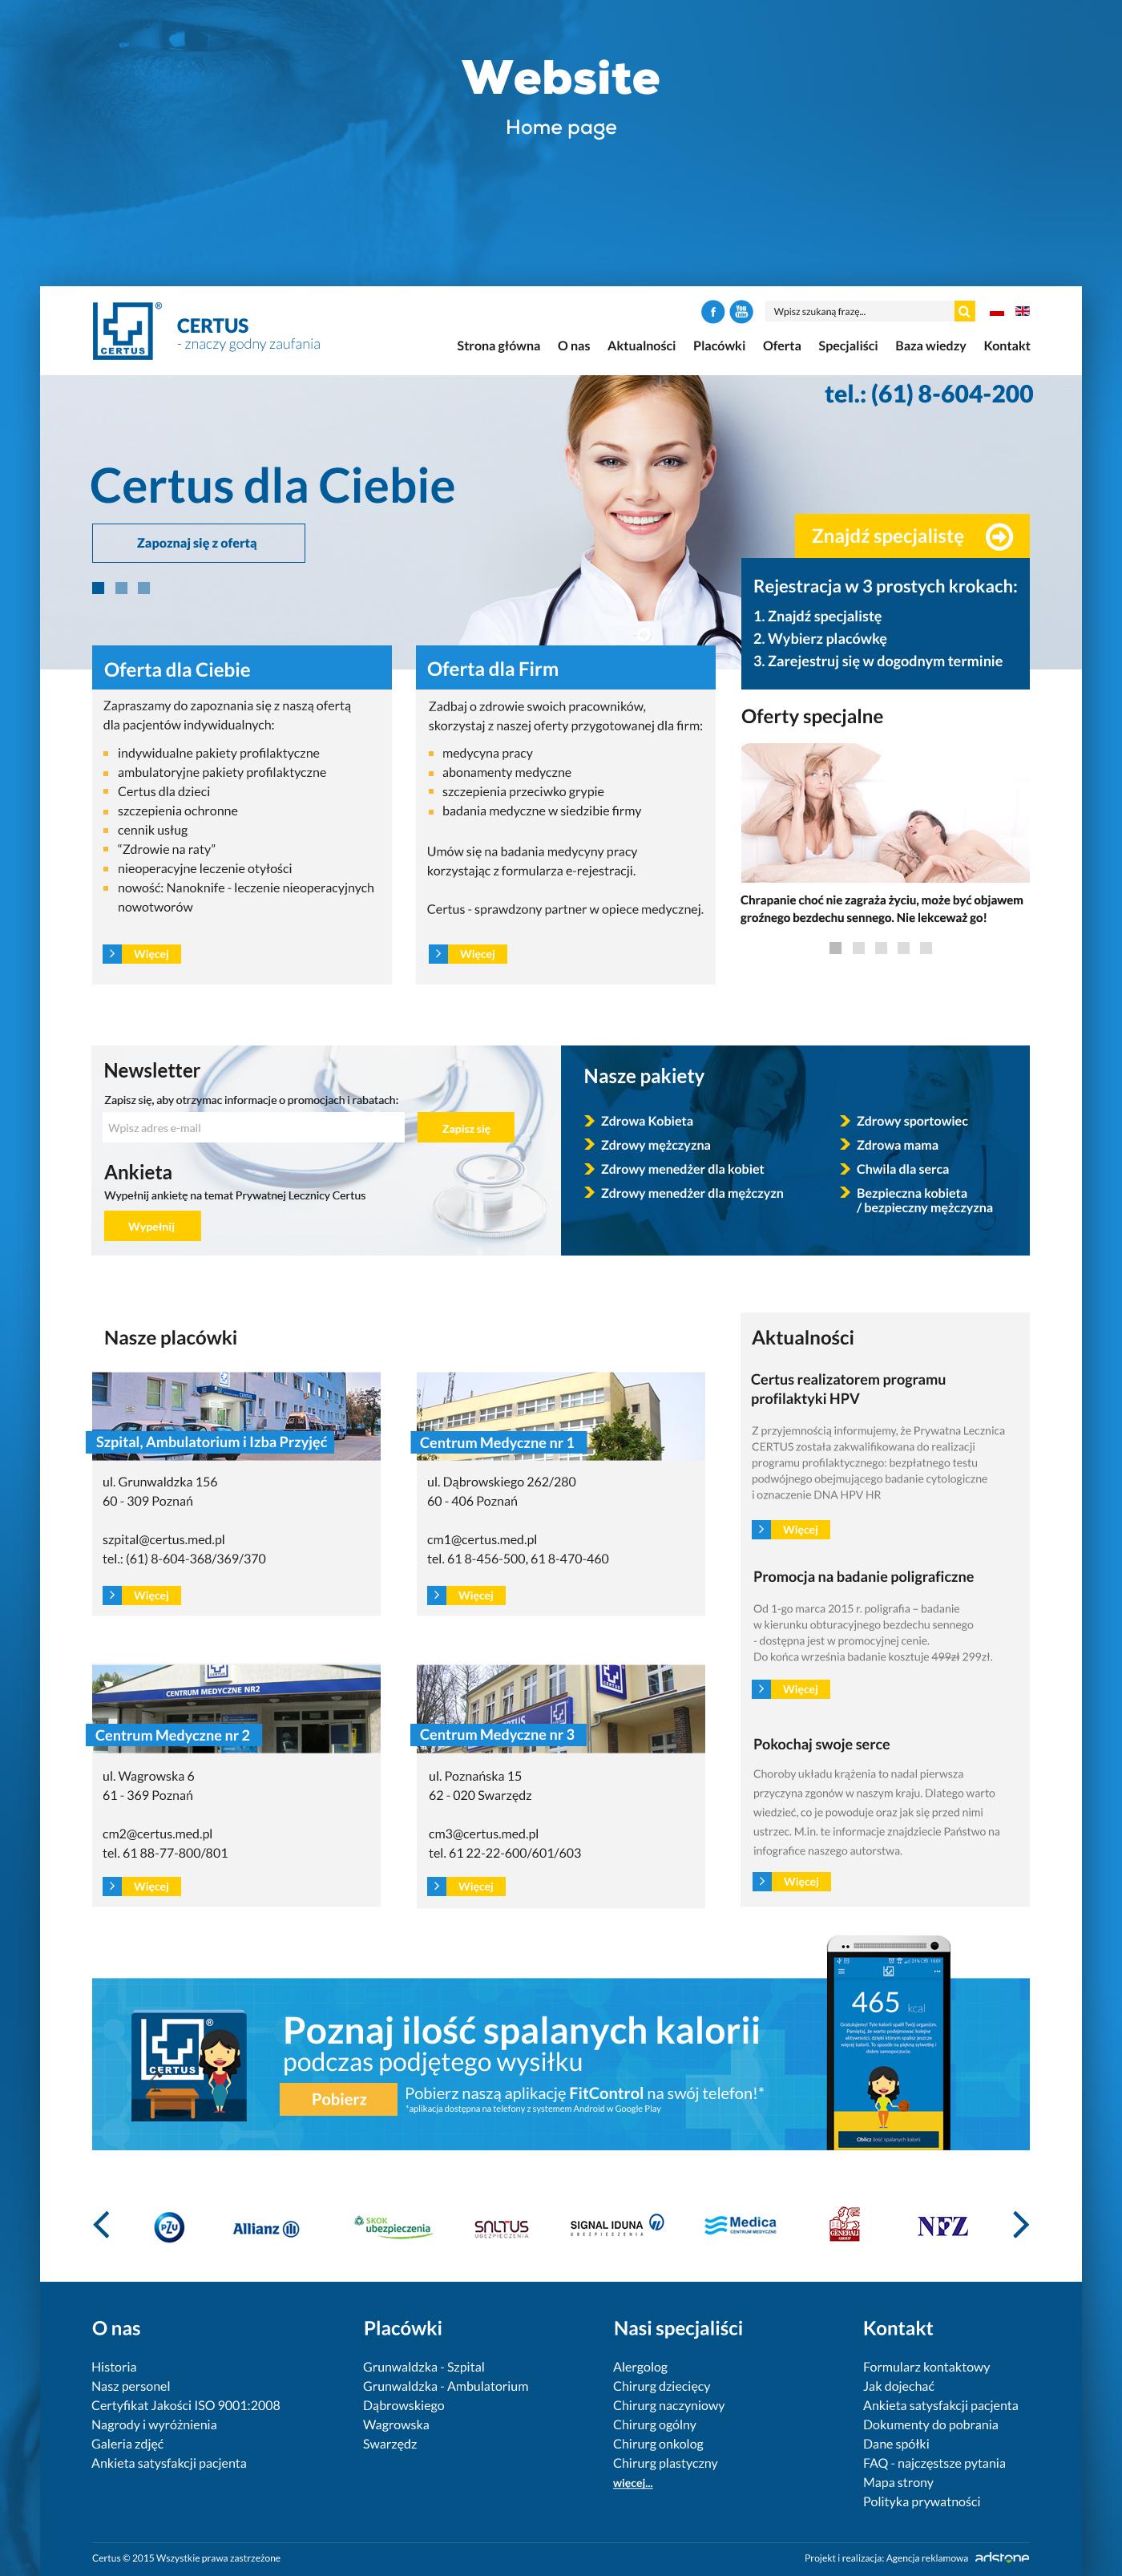 ux Web design Webdesign graphic medicine doctor hospital poland poznan adstone Health UI rwd